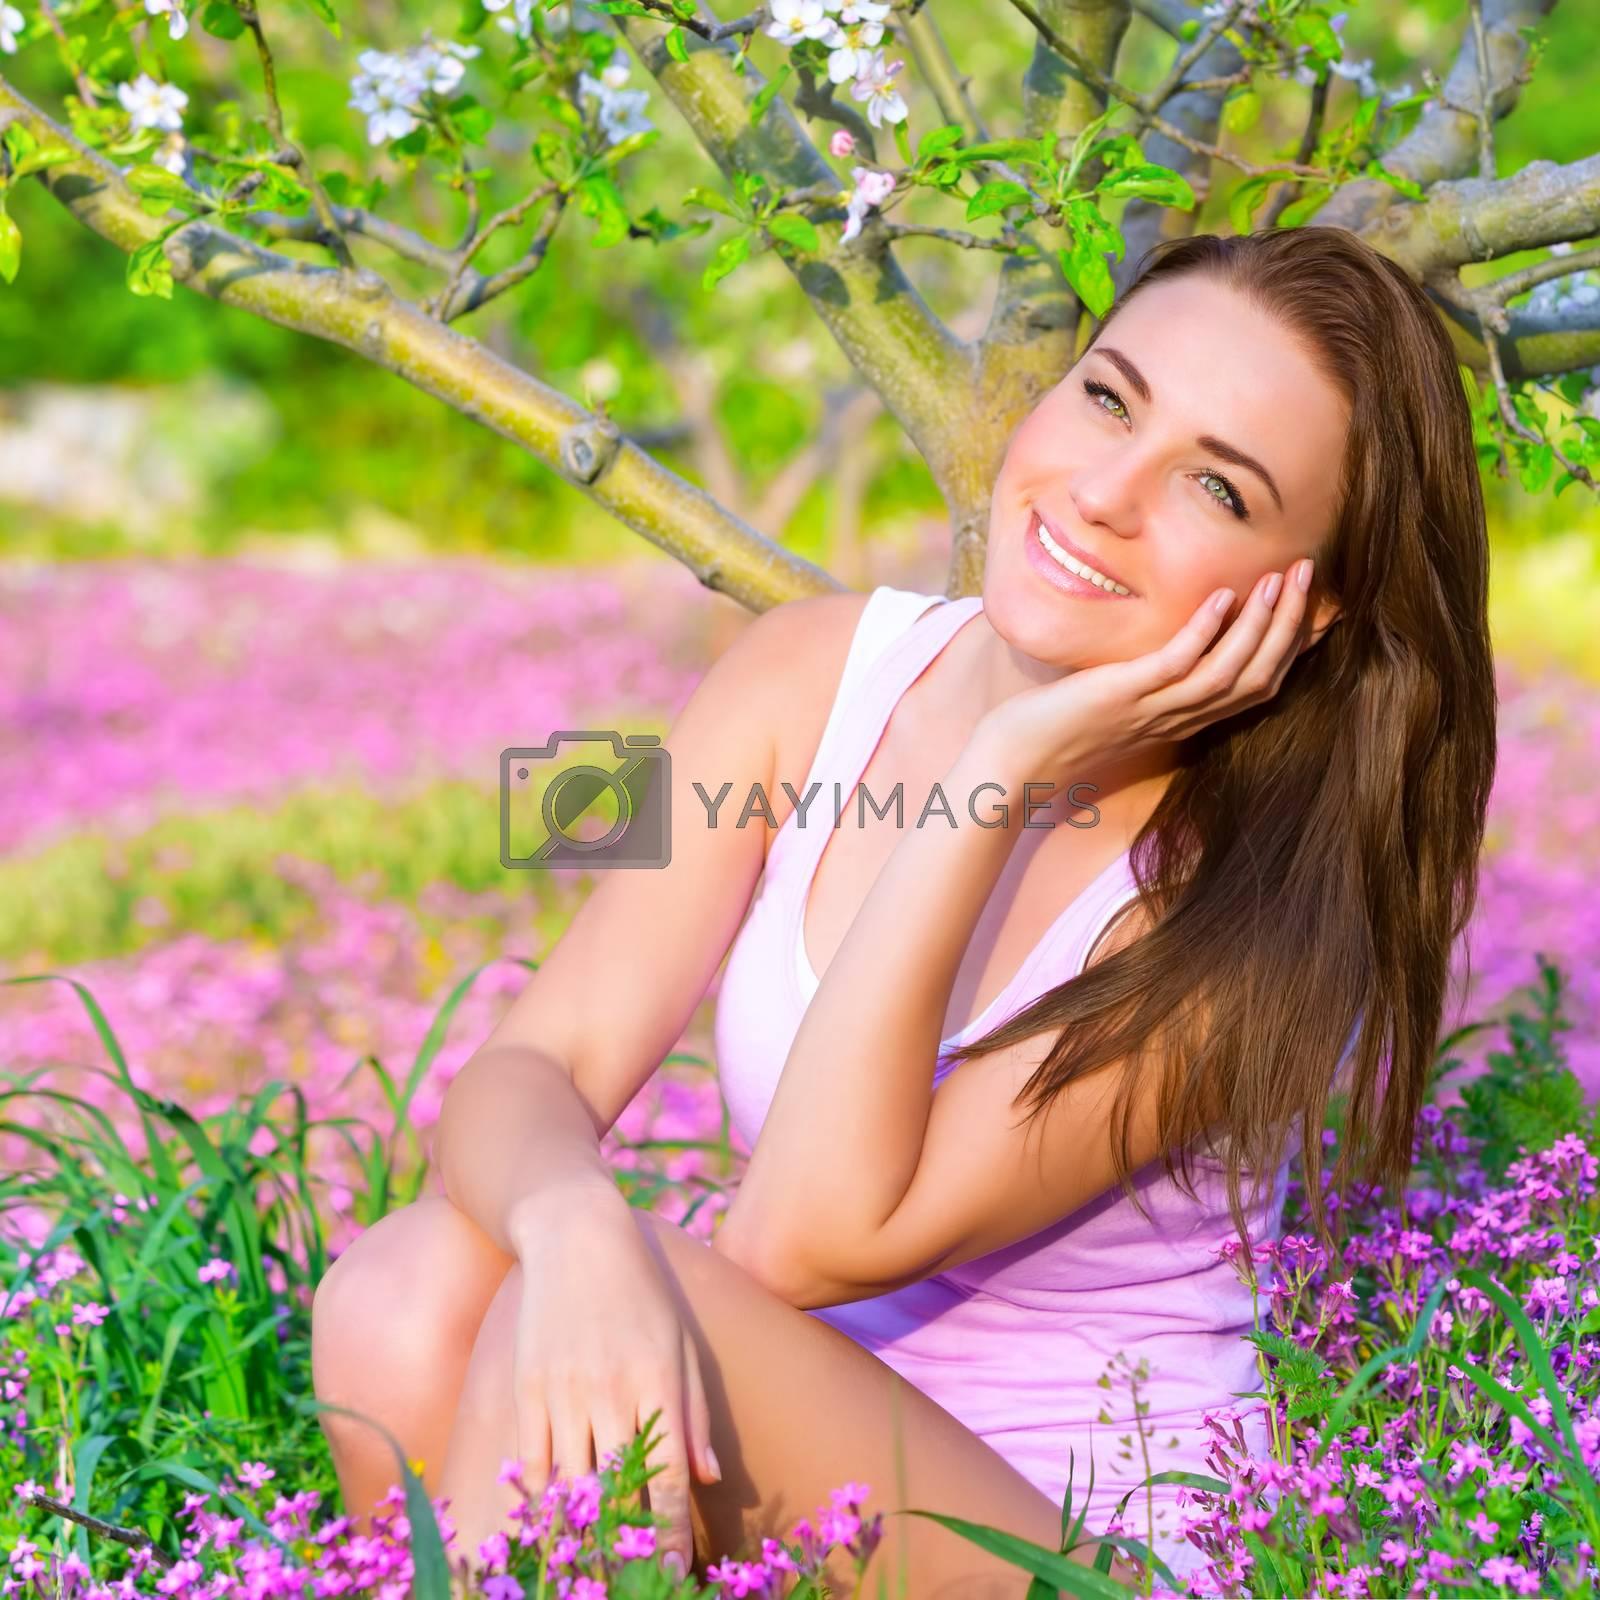 Royalty free image of Dreamy girl in spring garden by Anna_Omelchenko